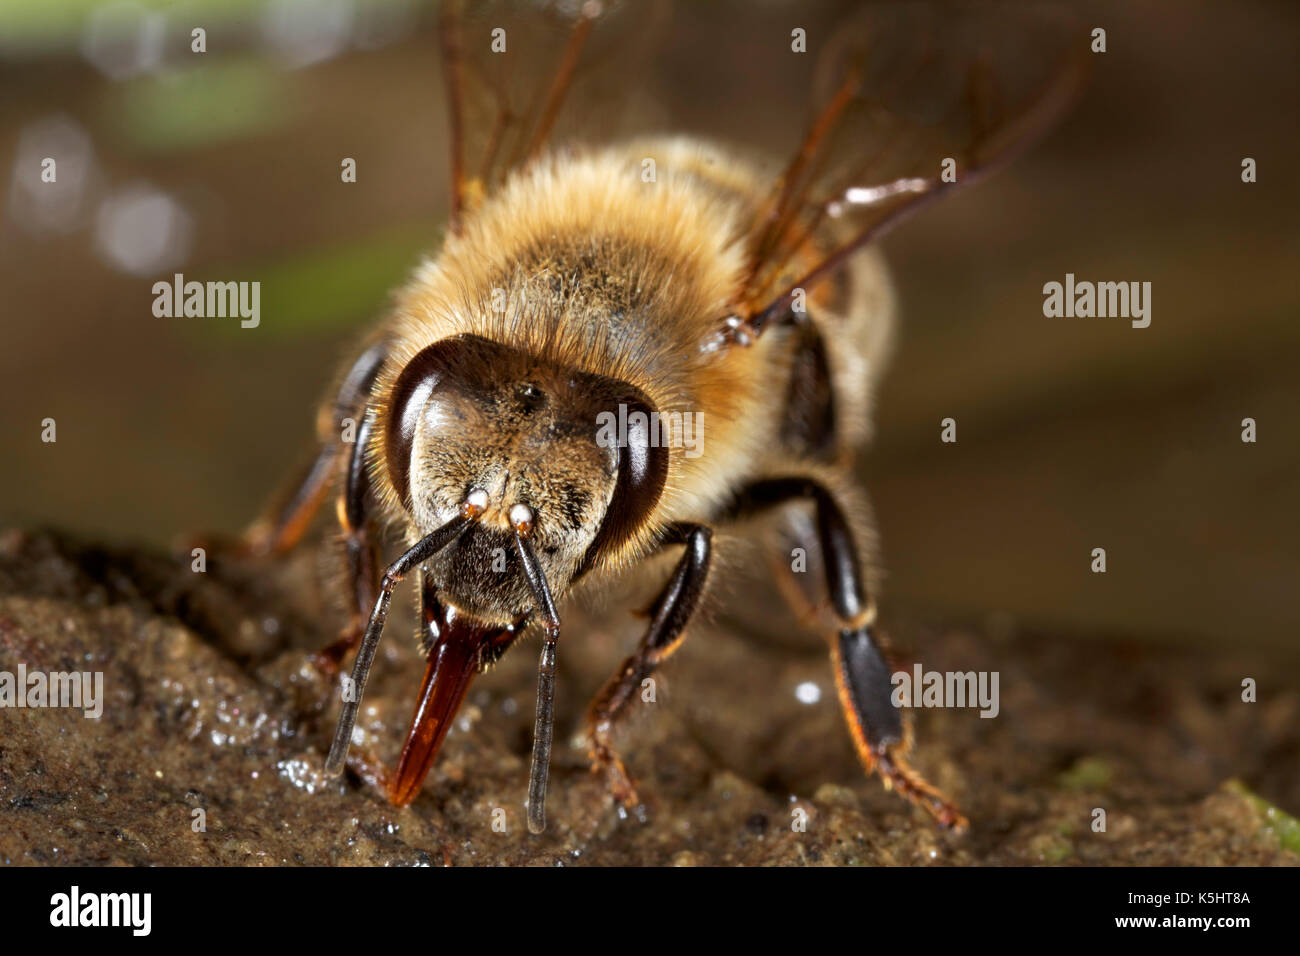 European honey bee drinking water - Stock Image